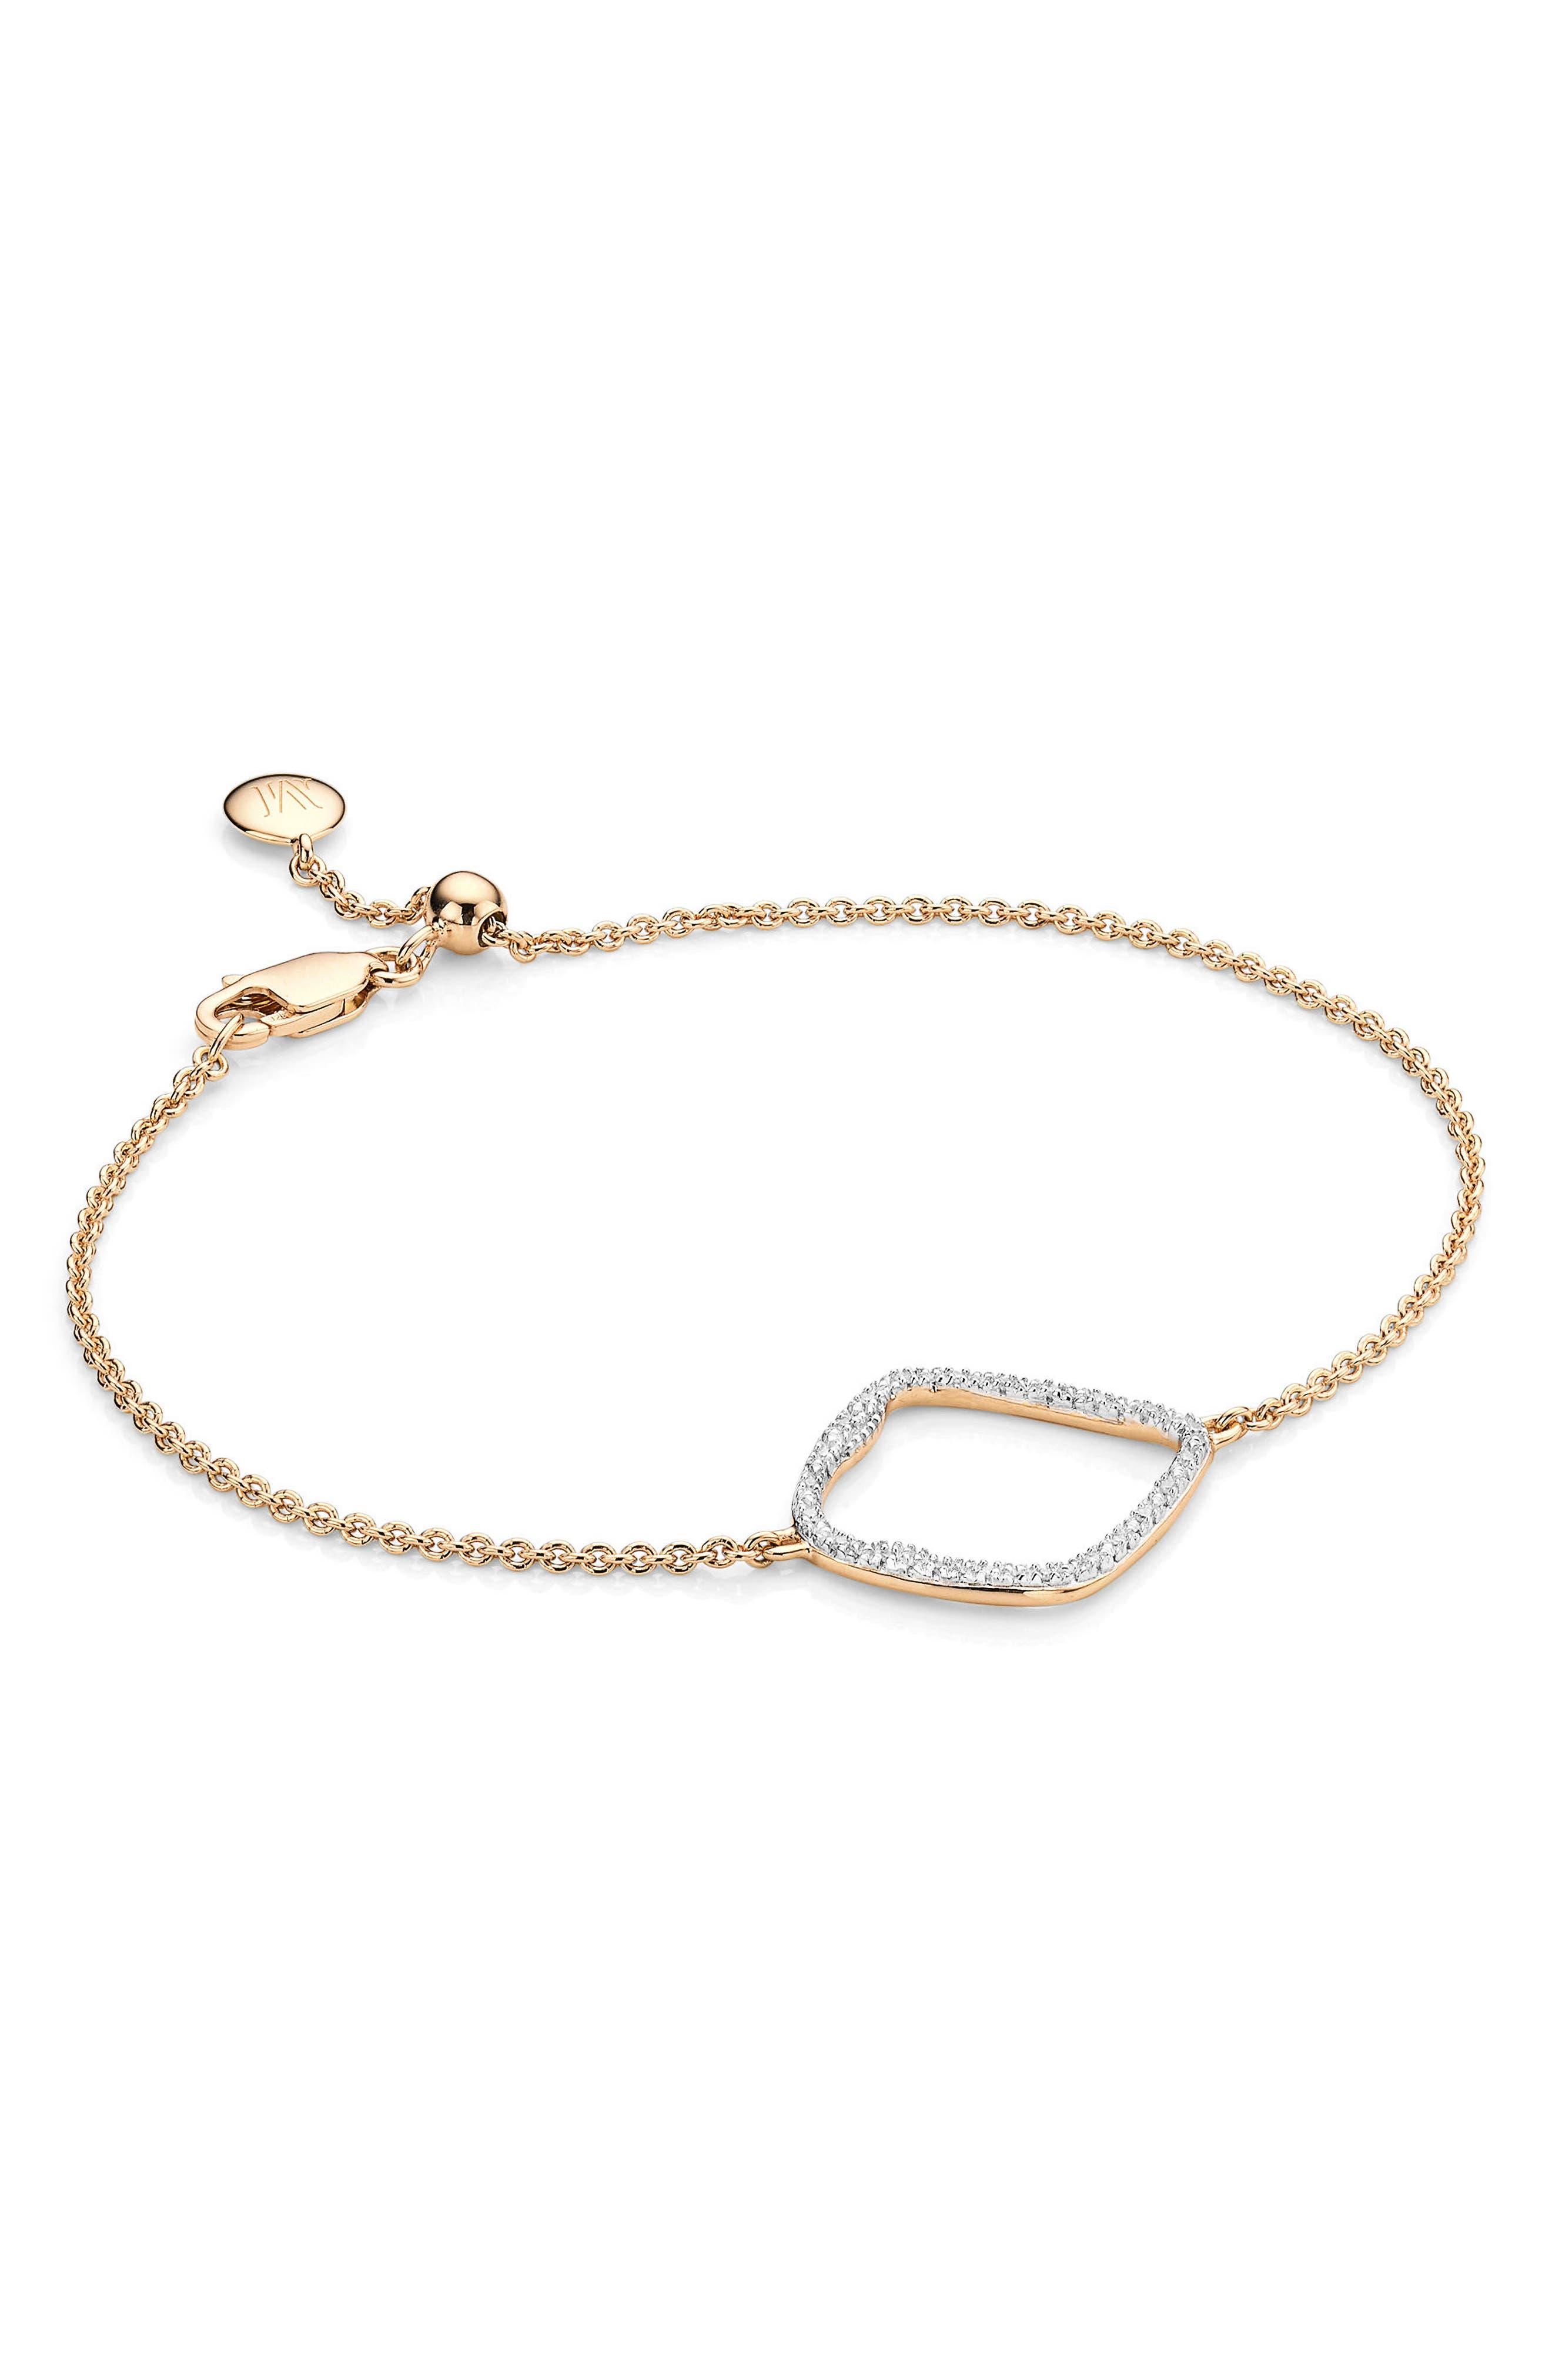 Main Image - Monica Vinader Riva Large Hoop Diamond Bracelet